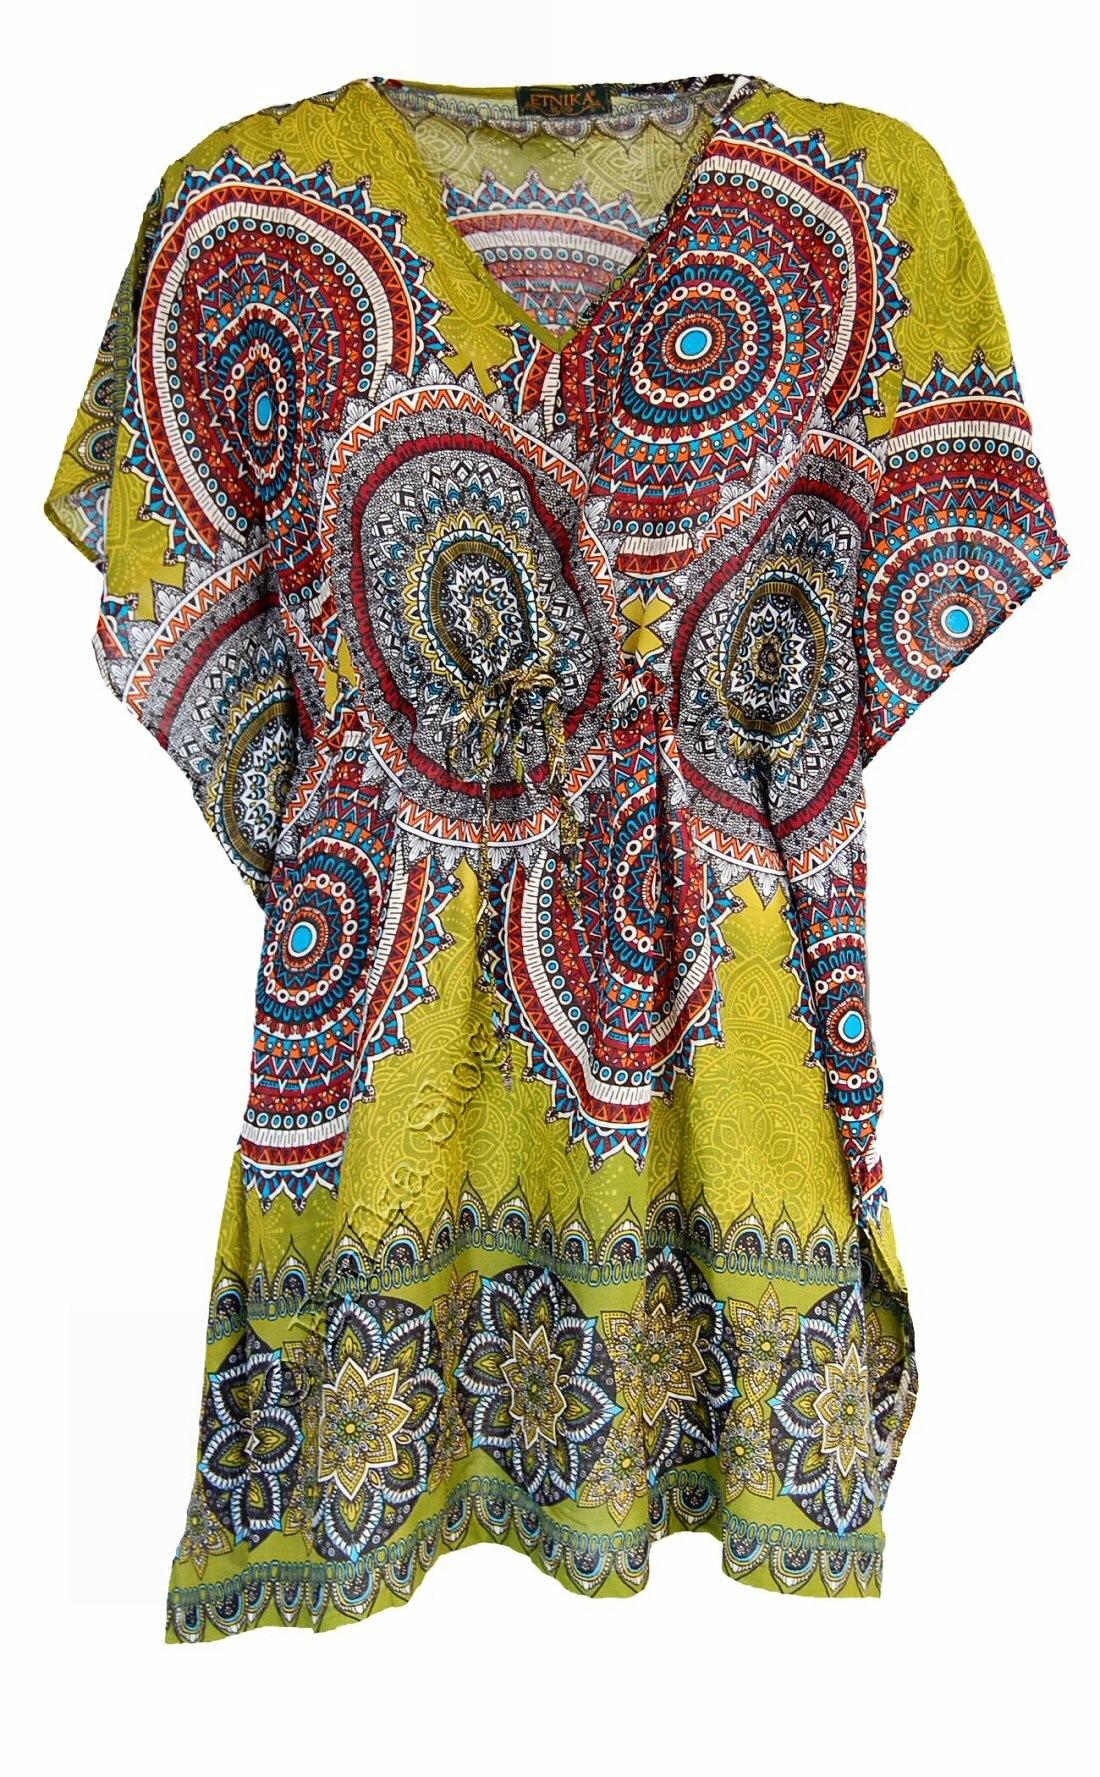 VISCOSE - SUMMER CLOTHING AB-BCV09AN - Oriente Import S.r.l.